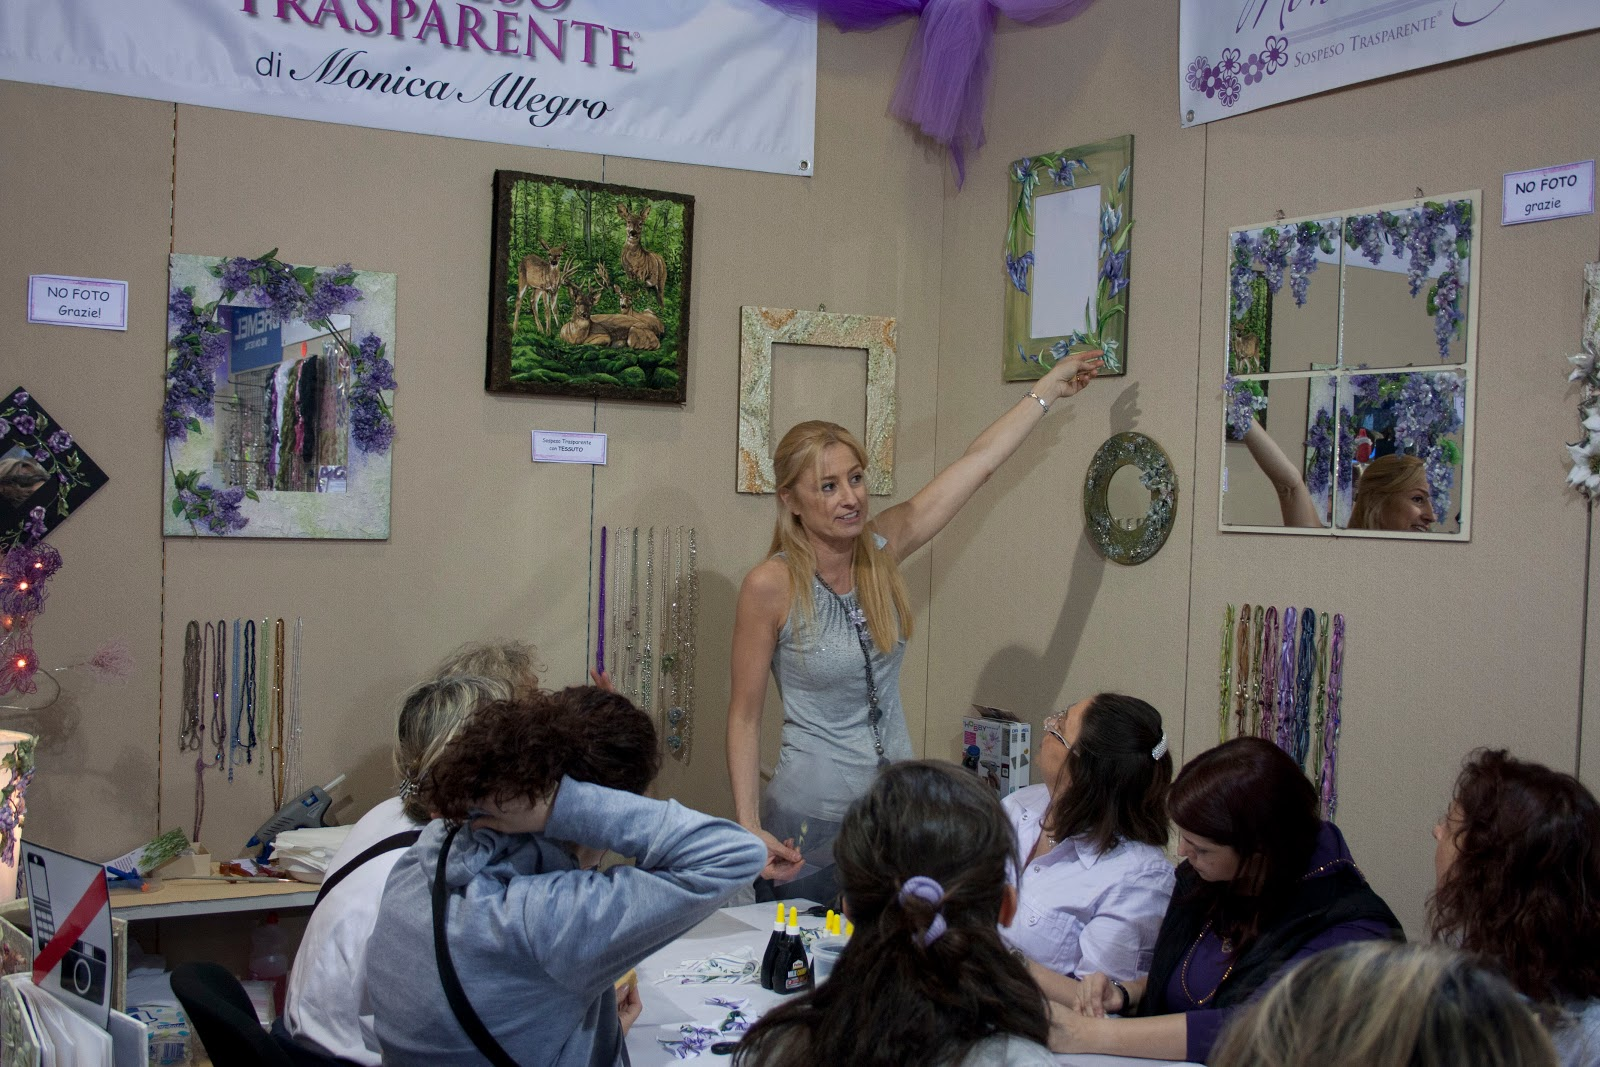 http://2.bp.blogspot.com/-5UTzLixDQOs/TaBQVDPq9EI/AAAAAAAAAGc/youQTt7SE4Y/s1600/laboratori_Monica_Allegro.jpg